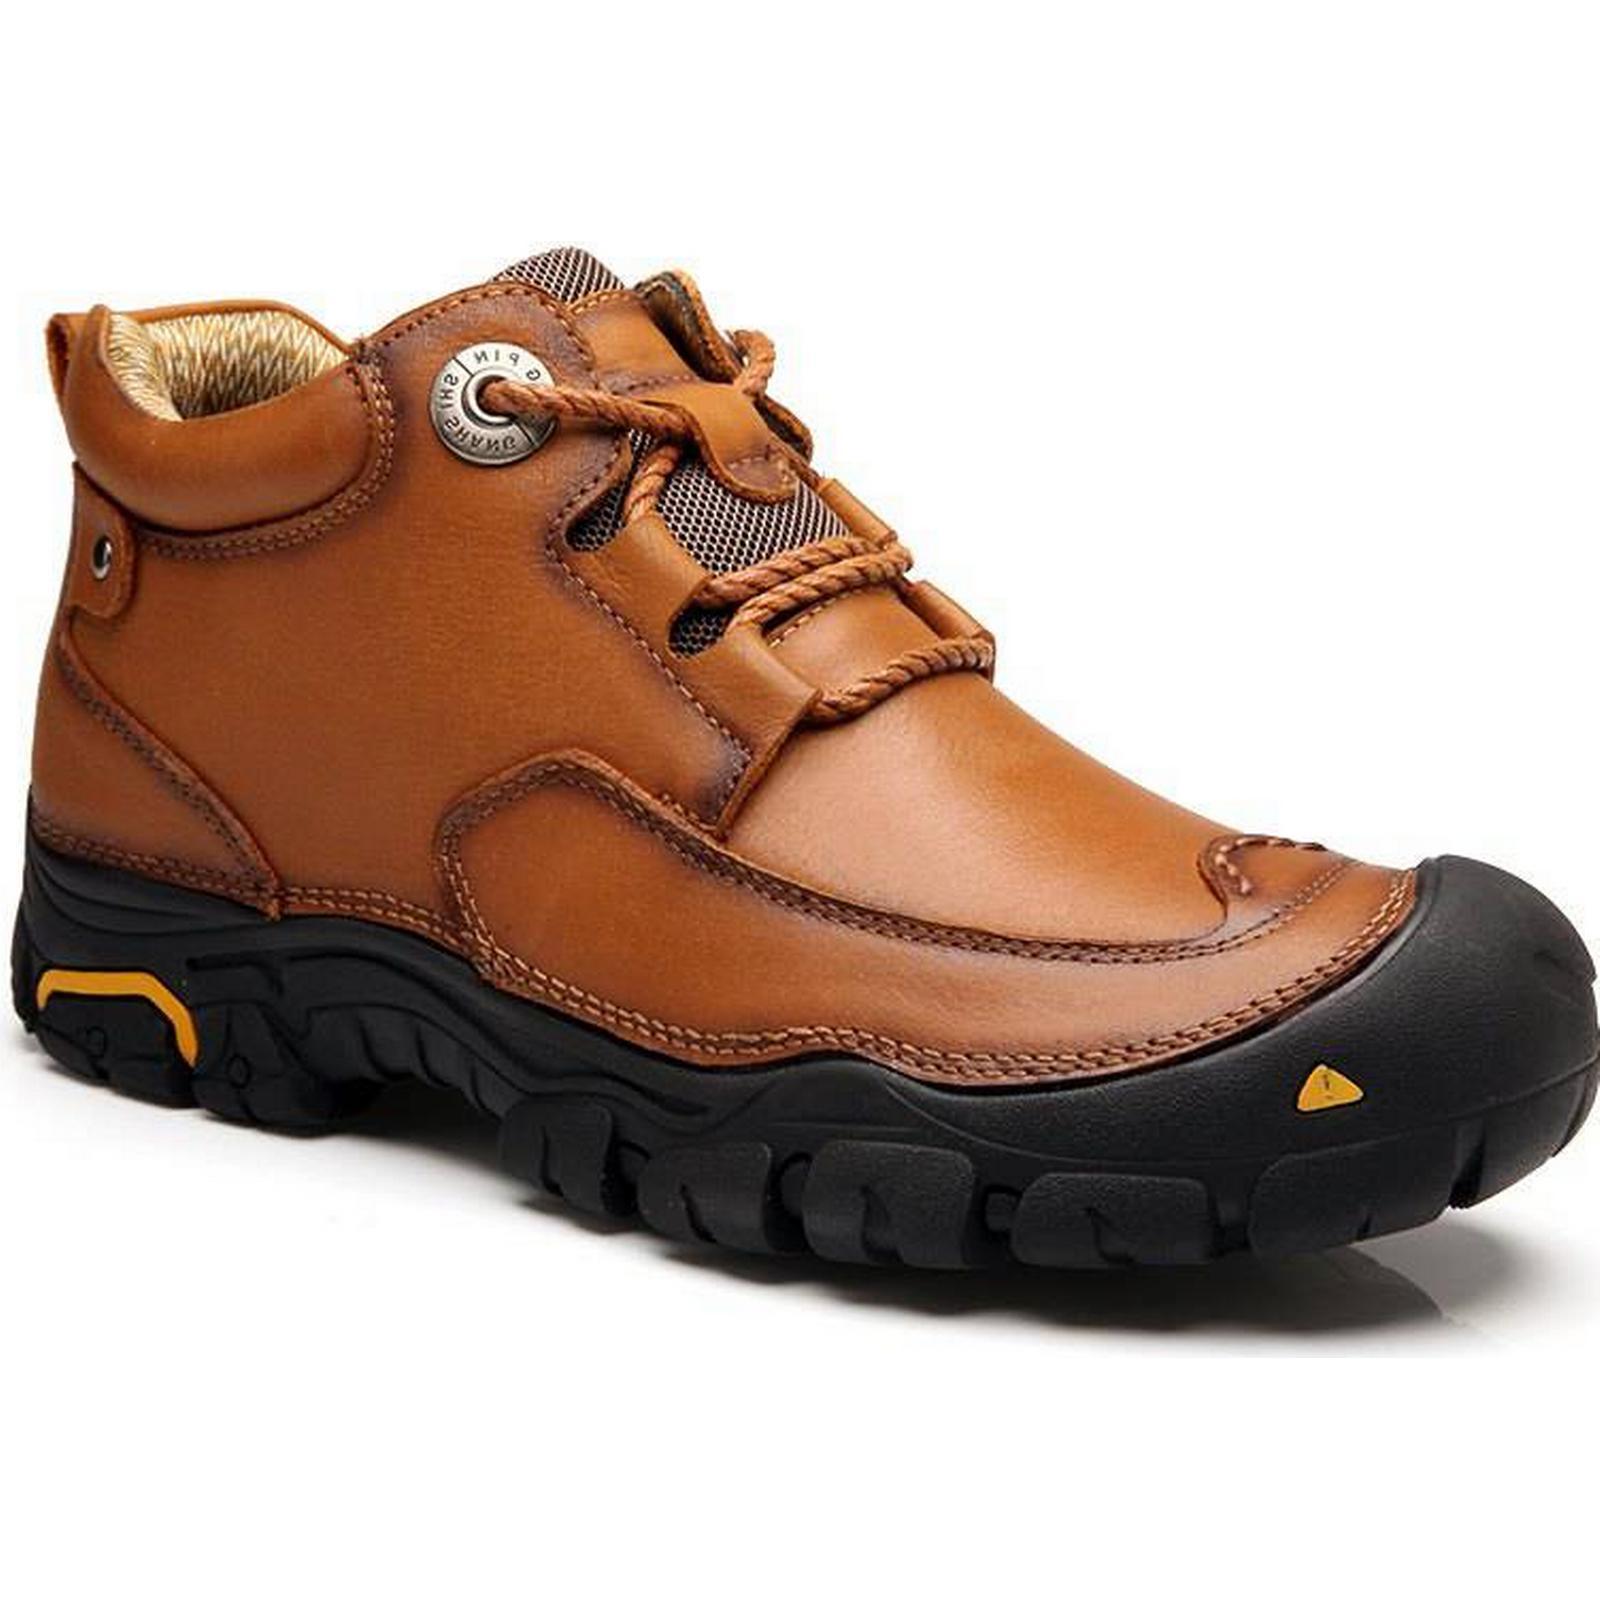 1 Fashion Anti-slip Anti-slip Fashion Mid Top Leather Boots for Men fbc446